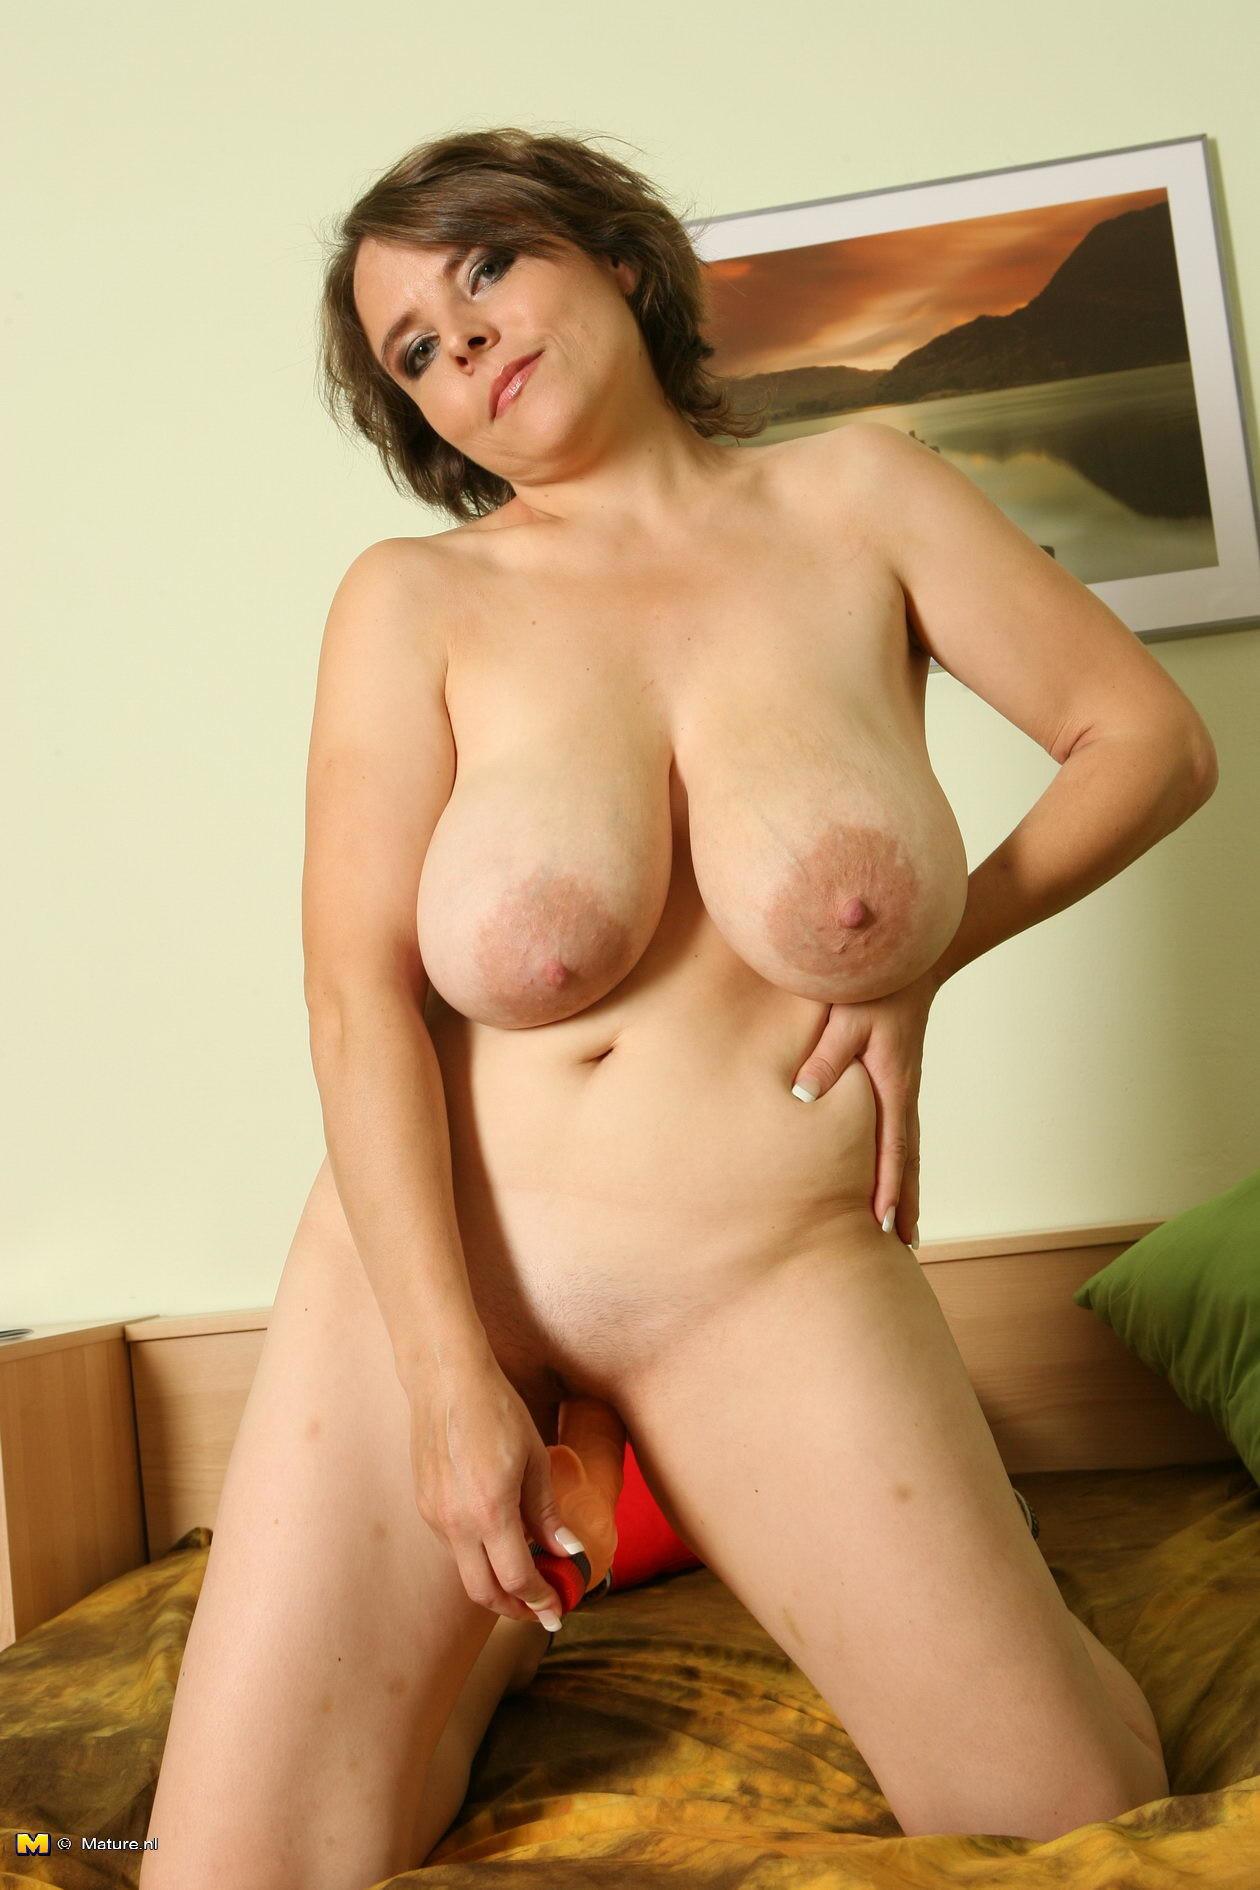 golie-grudastie-teti